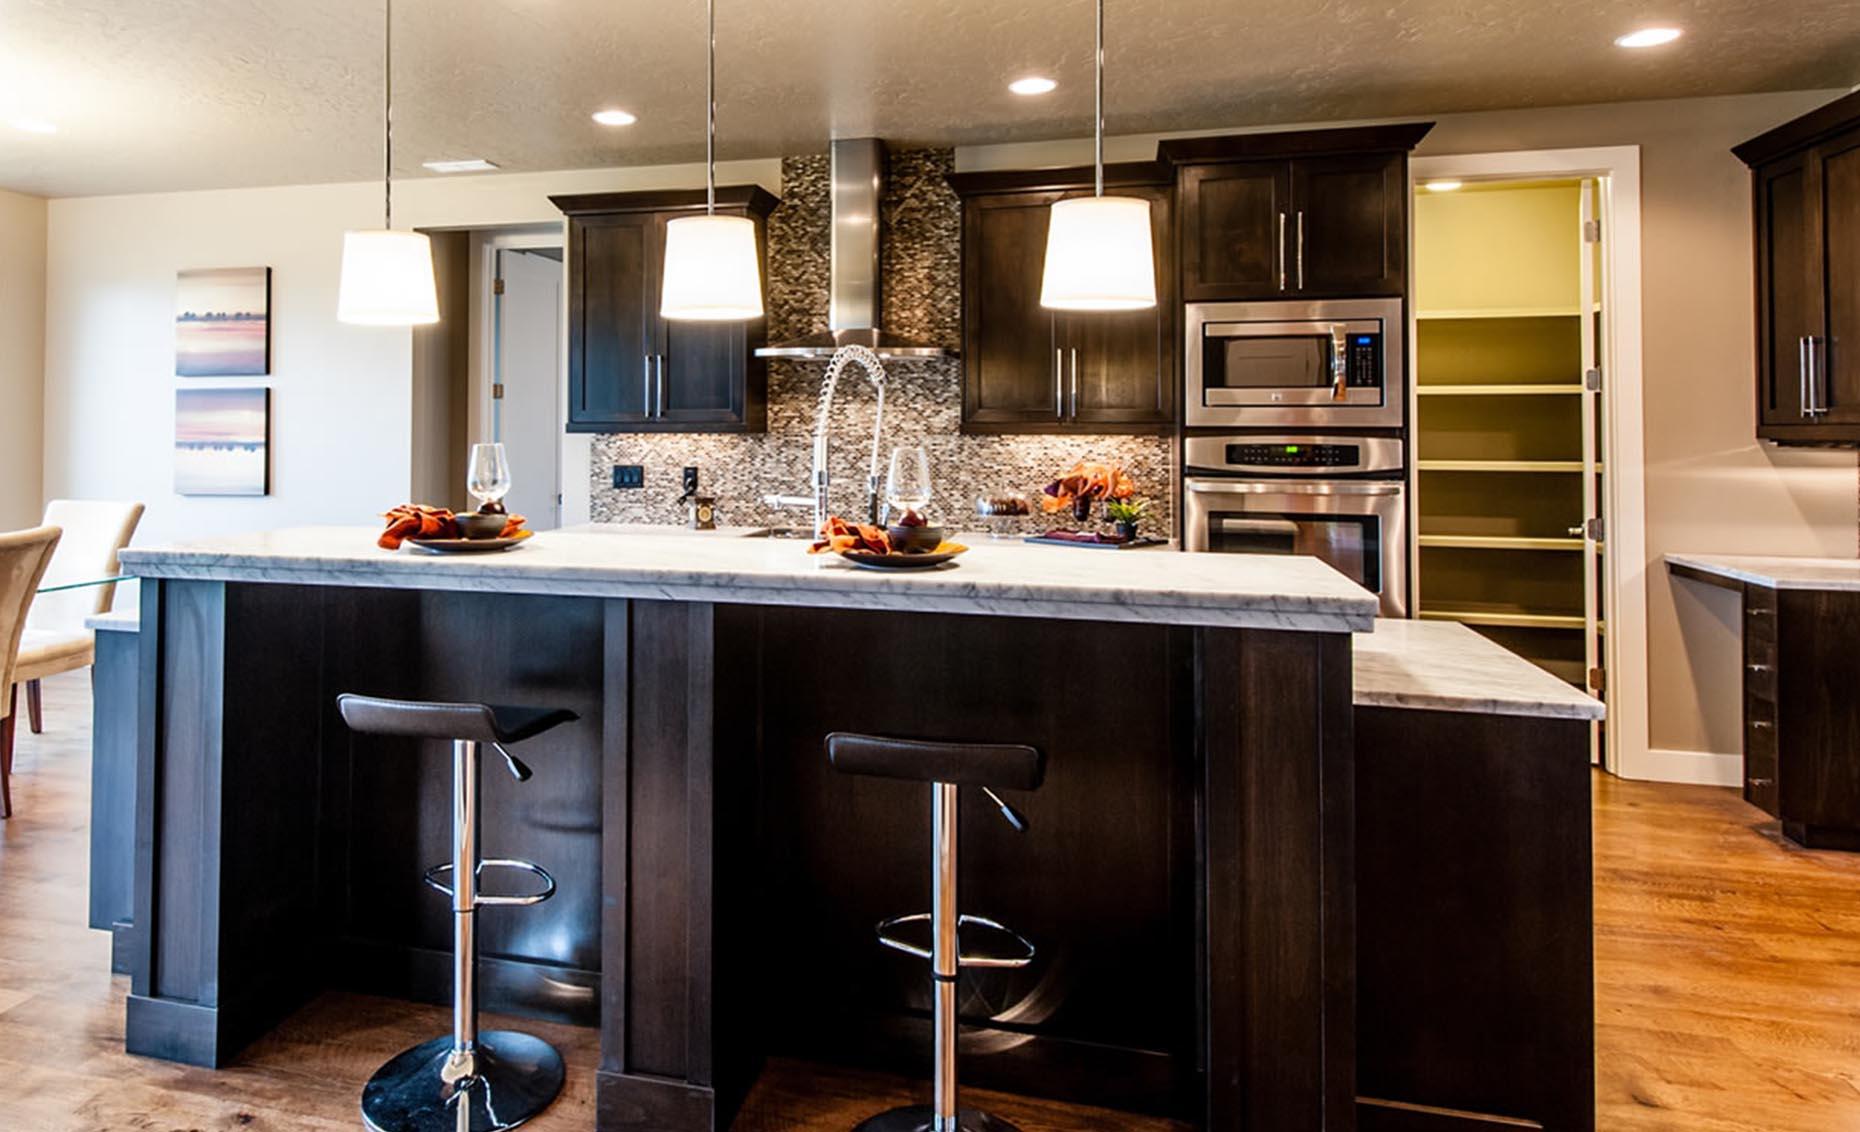 The Braveland House Kitchen